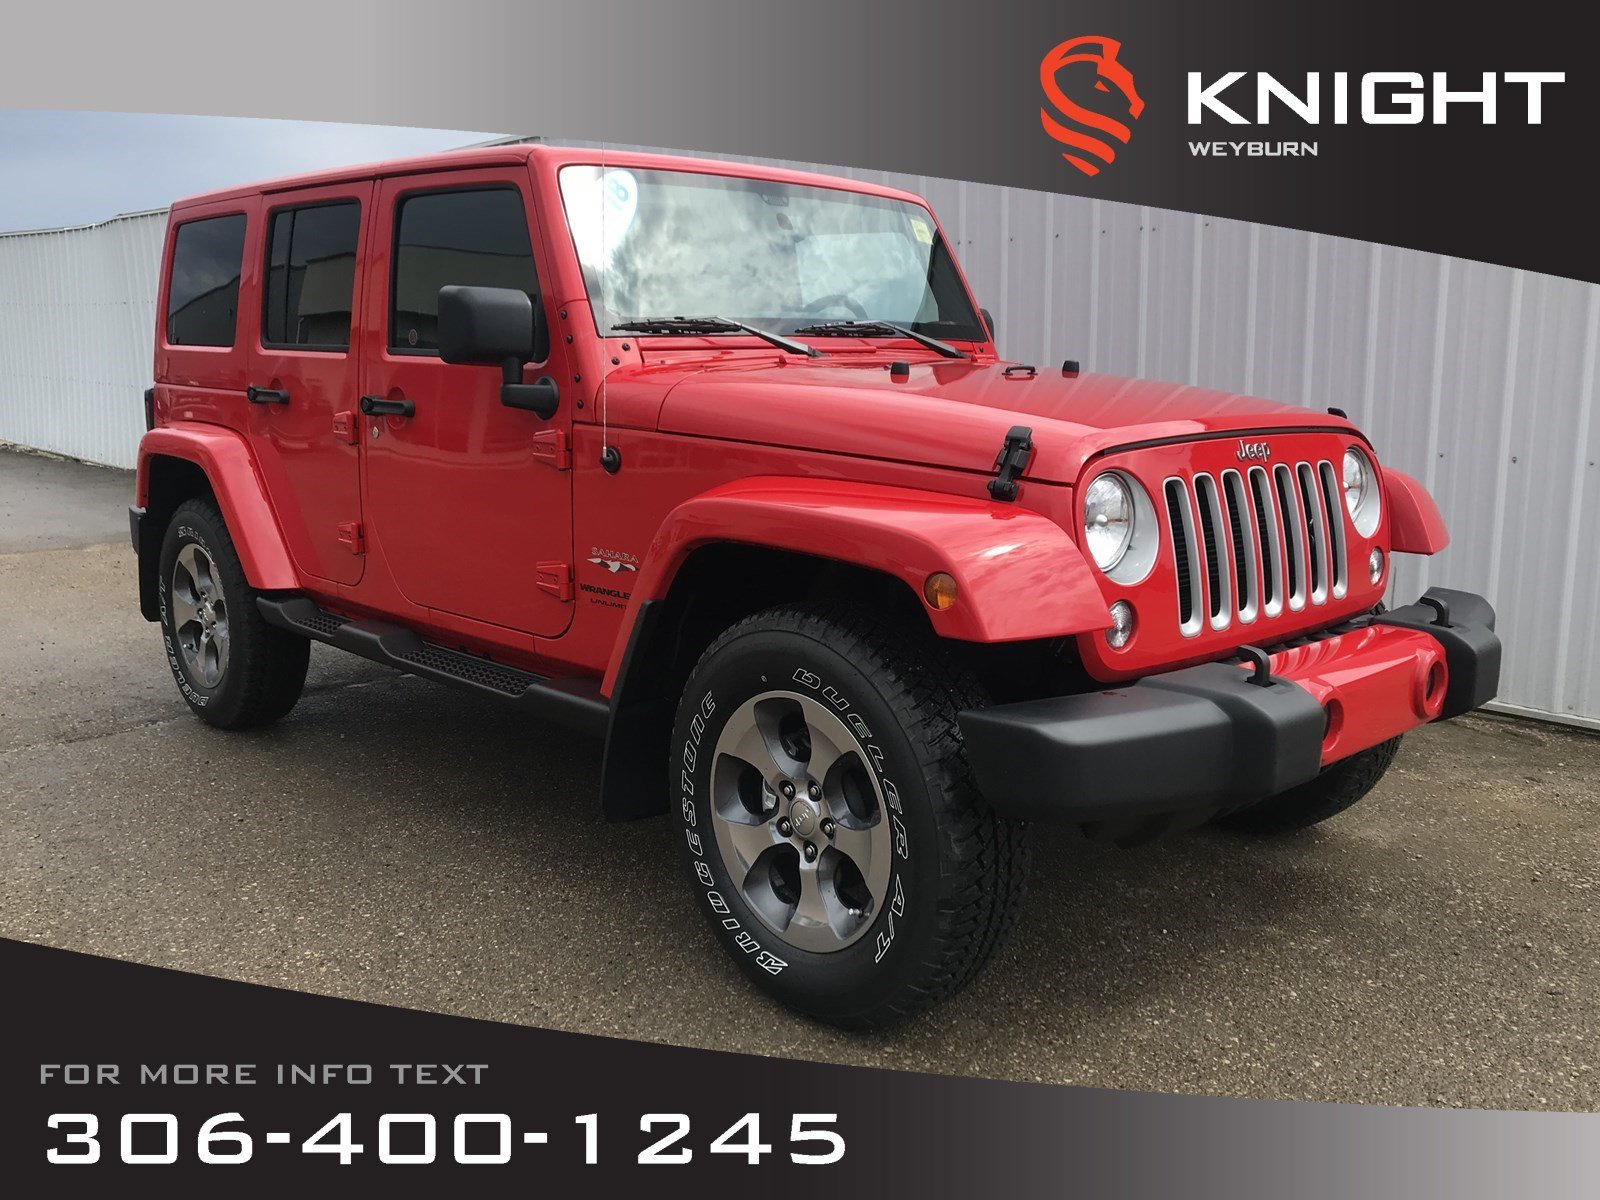 2018 Jeep Wrangler JK Sahara | Heated Seats | Navigation | Remote Start SUV